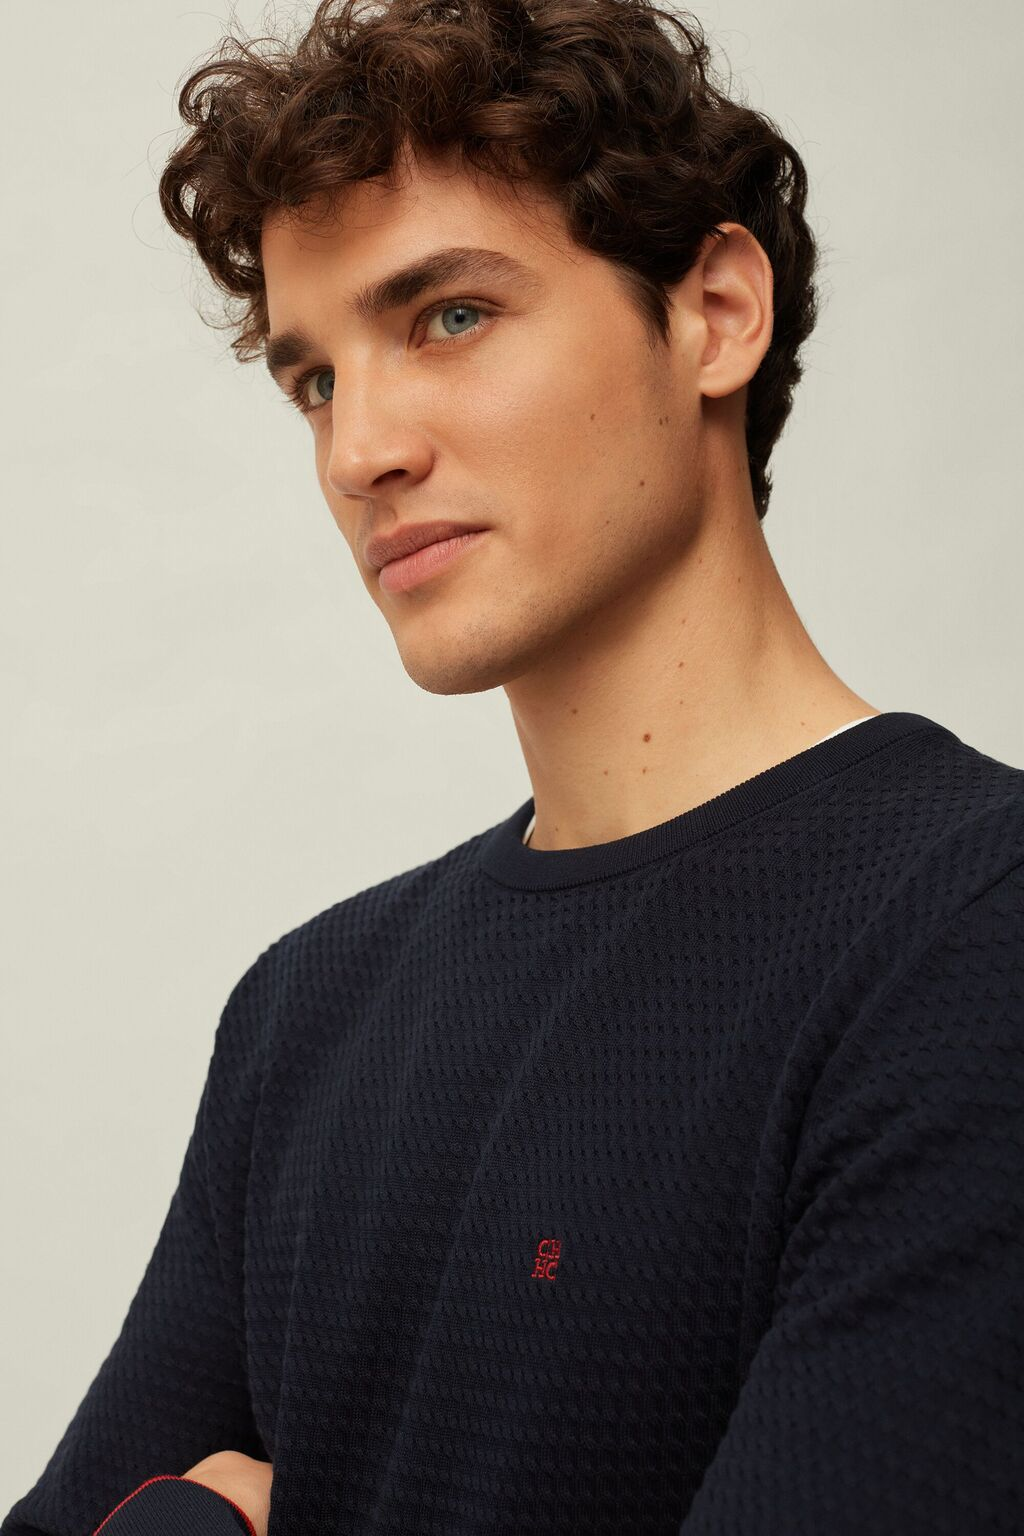 Braided cotton sweater